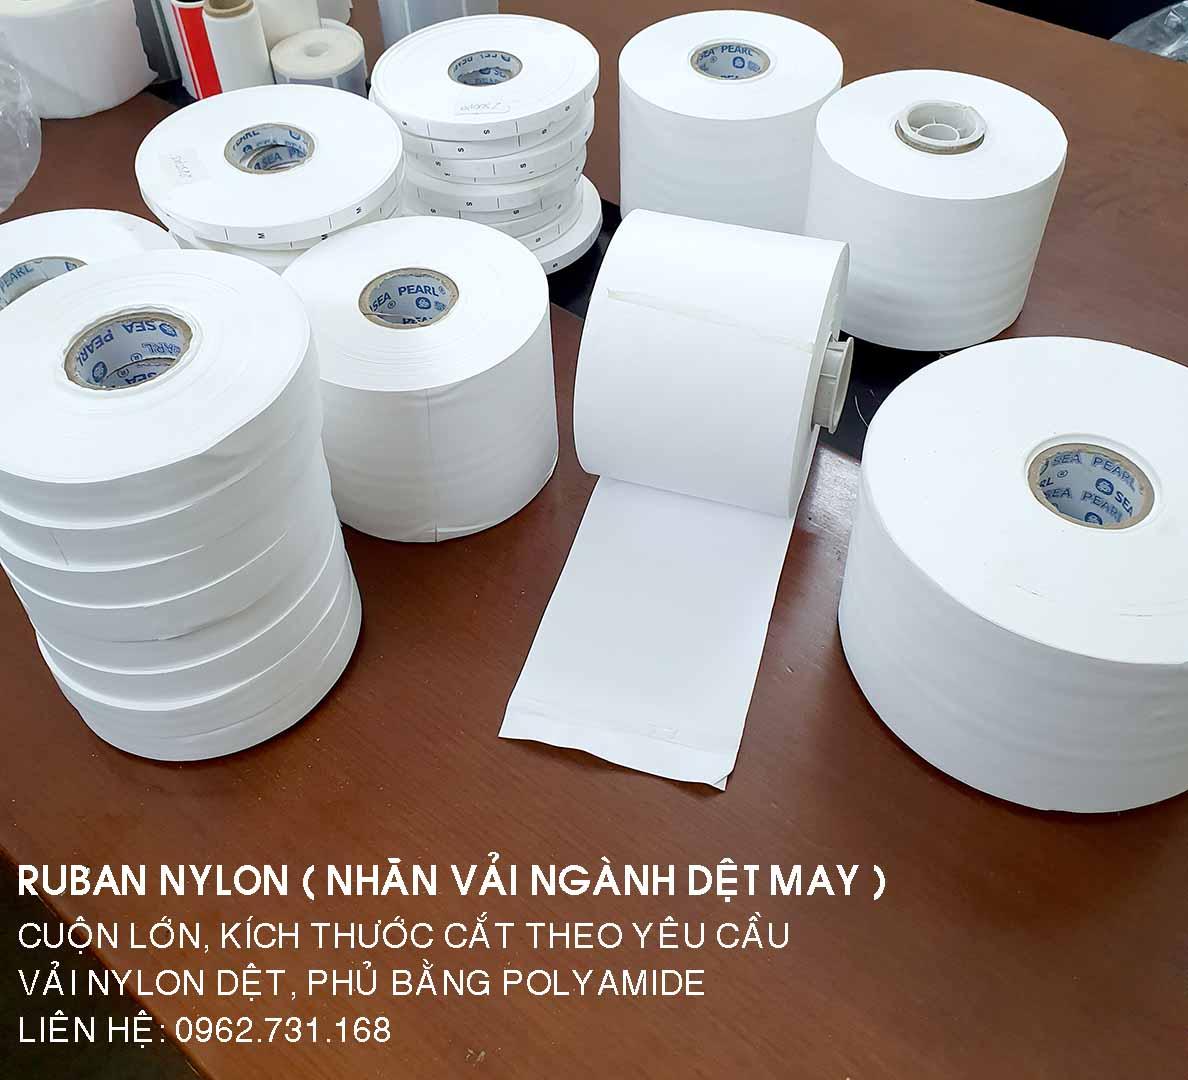 Ruban Nylon